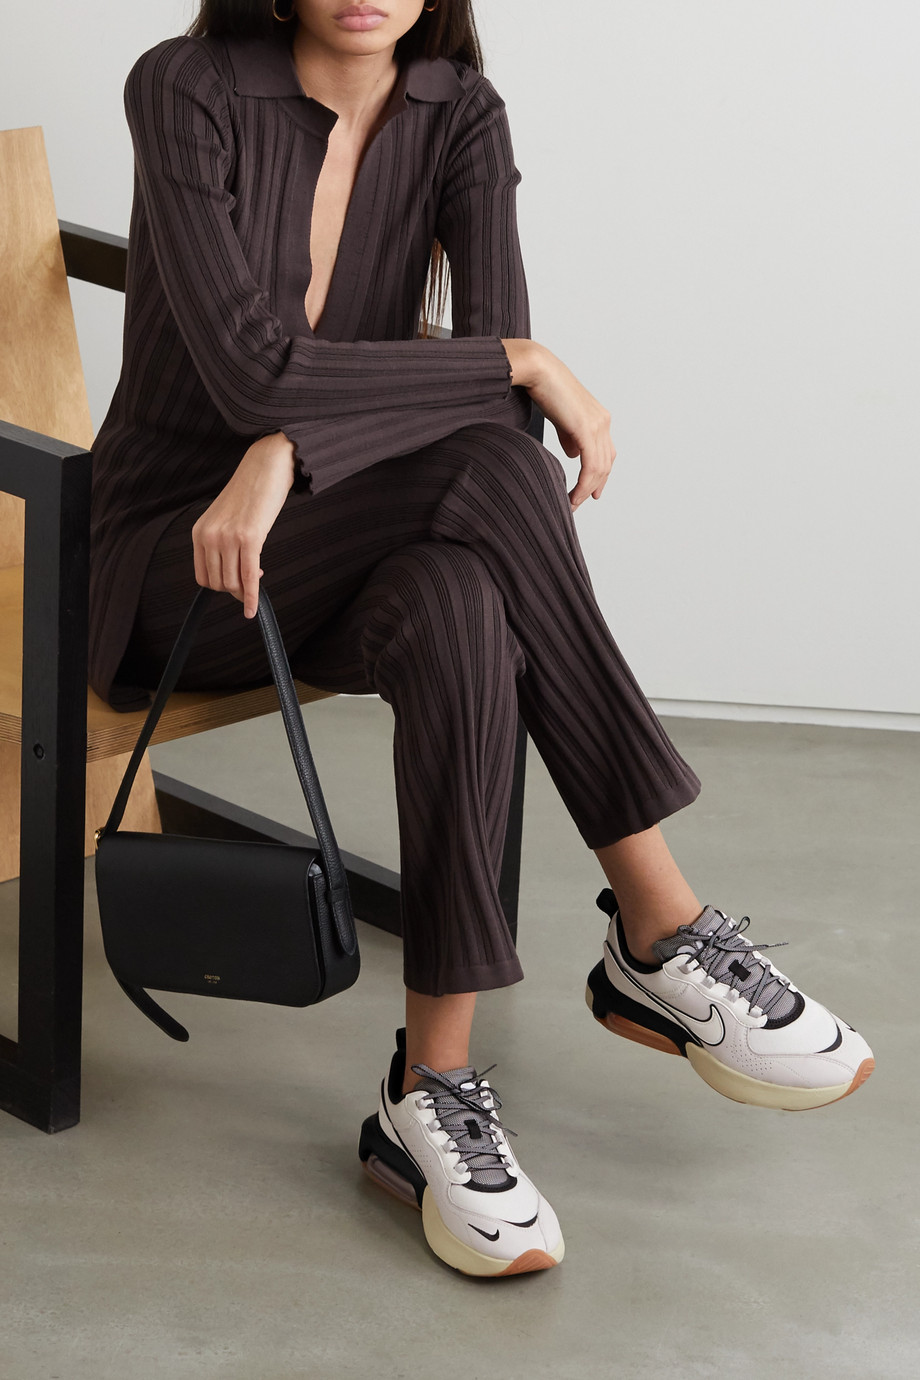 Nike Air Max Verona Sneakers aus Leder und Nubukleder